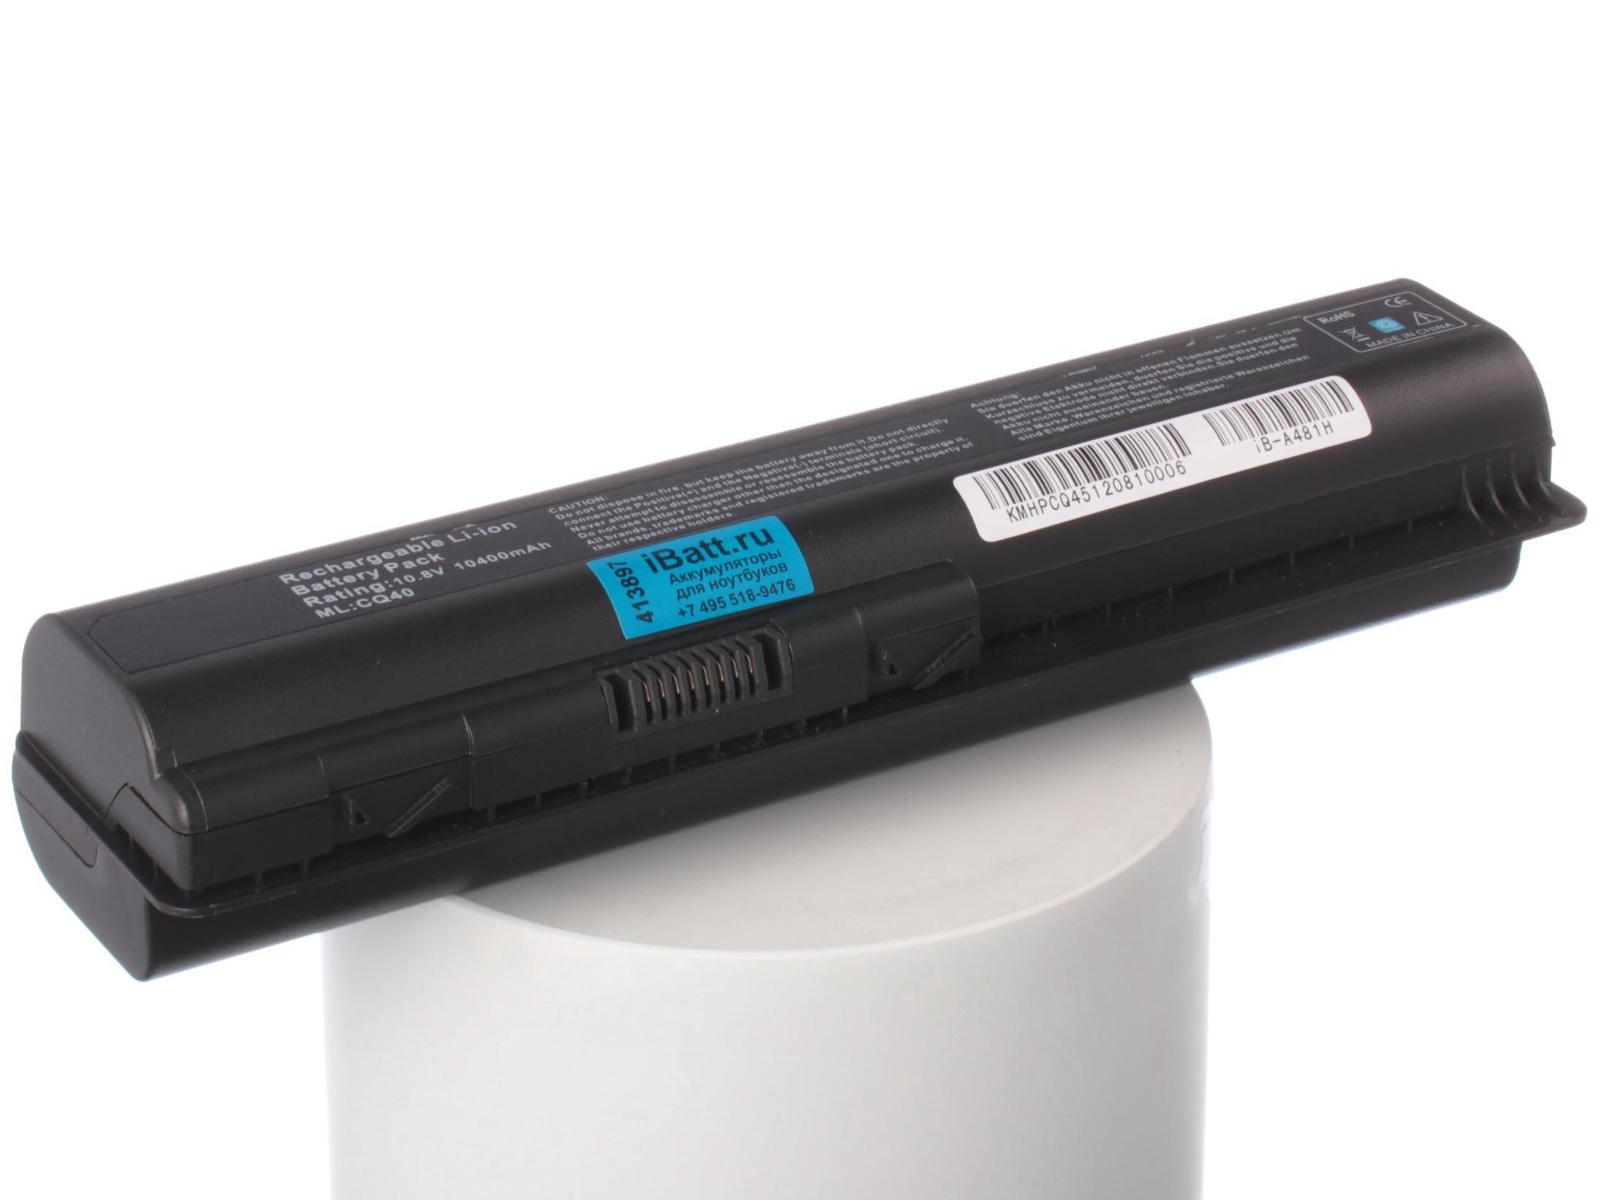 Аккумулятор для ноутбука iBatt для HP-Compaq Pavilion dv5-1010ez, Pavilion dv5-1050er, Pavilion dv5-1105el, Pavilion dv5-1199eo, Pavilion dv5-1205tx, Pavilion dv5-1251nr, Pavilion dv5-1255er, Pavilion dv6-1210er 482867 001 for hp pavilion dv5 1000 notebook 482867 001 for hp pavilion dv5 dv5 1000 dv5 1100 laptop motherboard fully tested